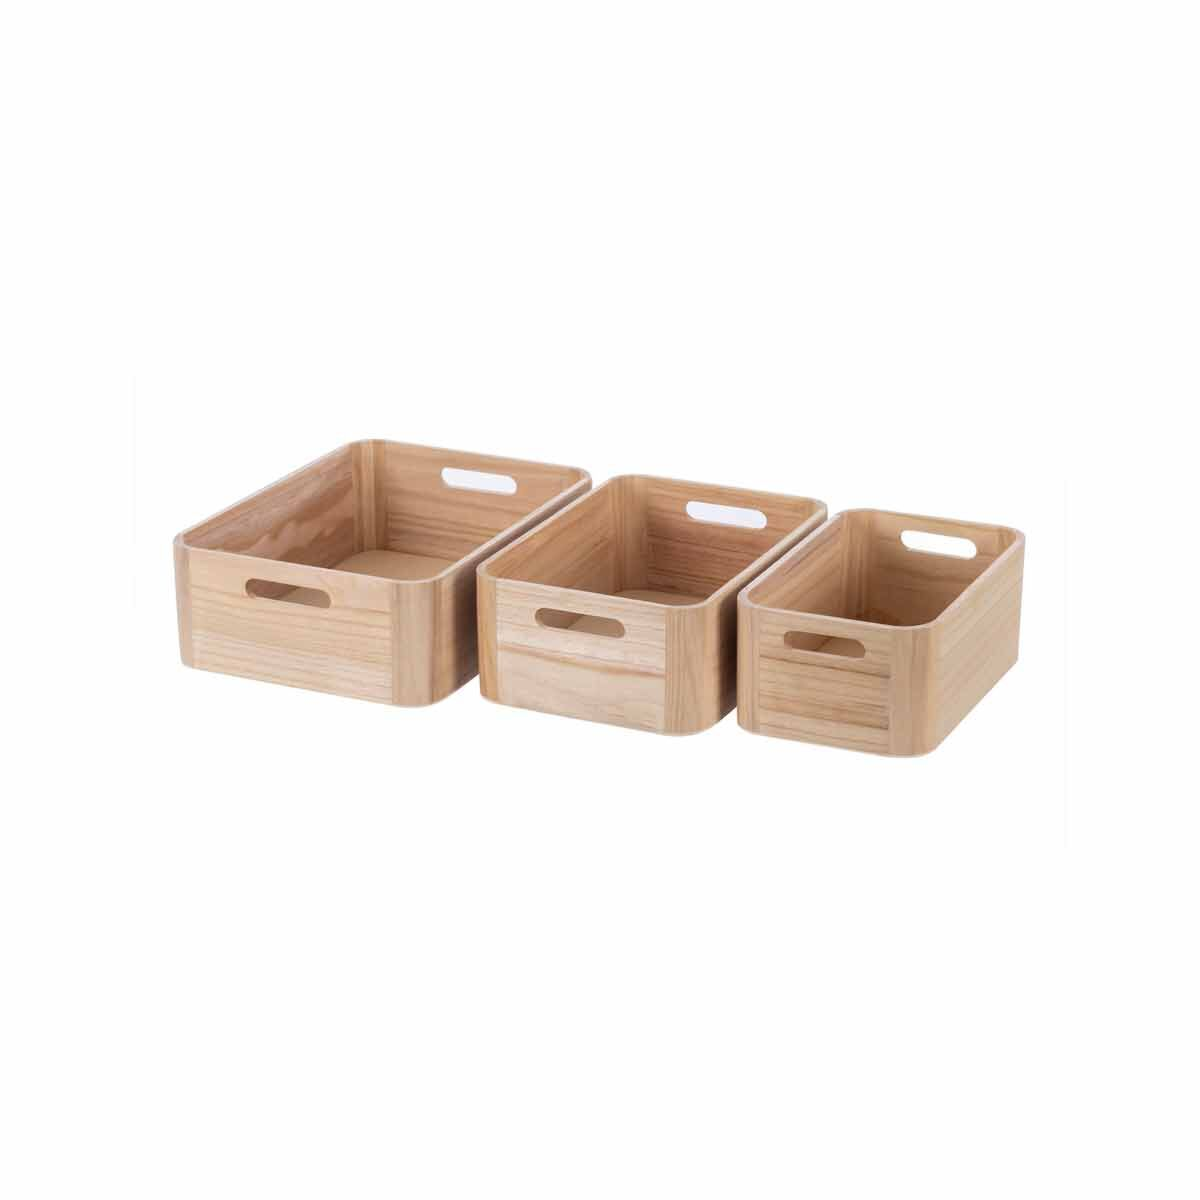 Ryman Wooden Storage Set of 3